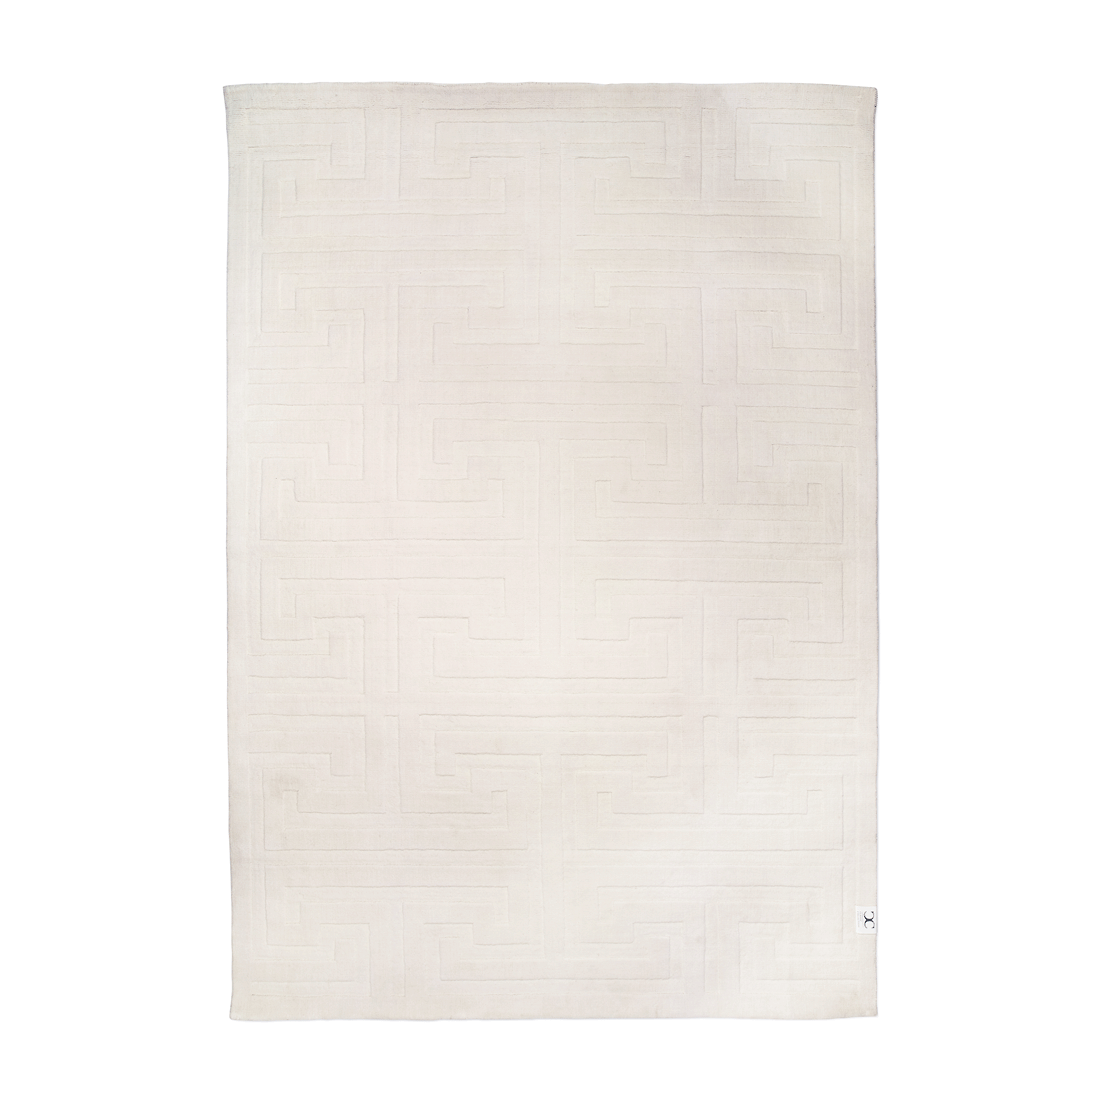 Vit ullmatta KEY WOOL 250 x 350 cm, Classic Collection